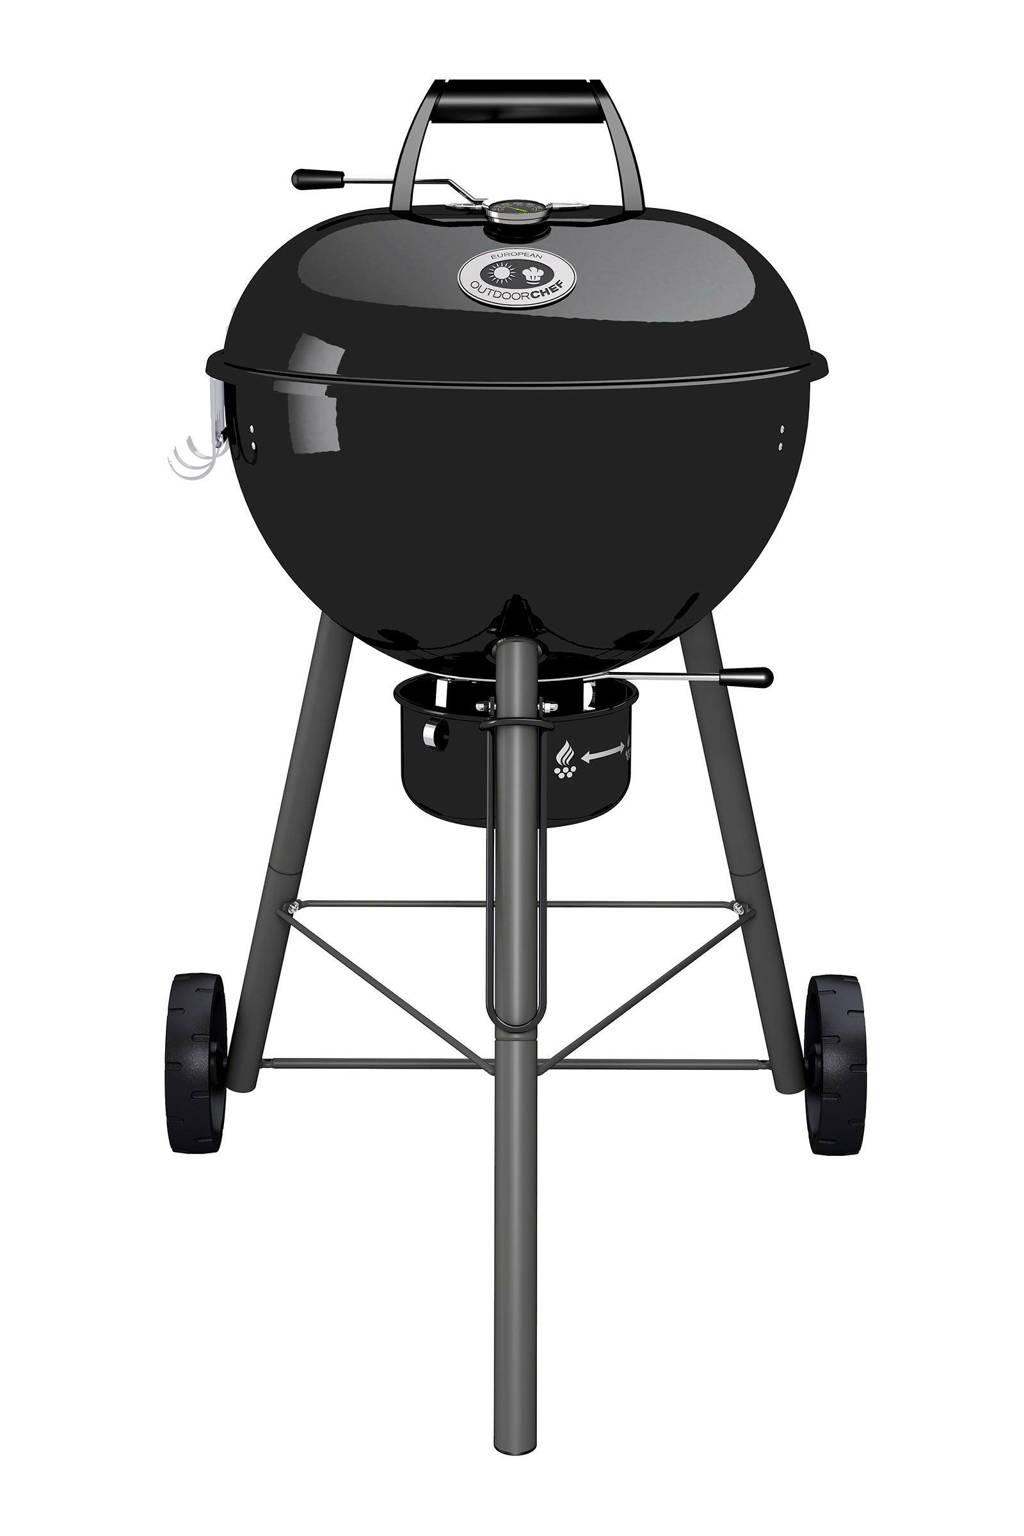 Outdoorchef Chelsea 480 C houtskoolbarbecue, Zwart